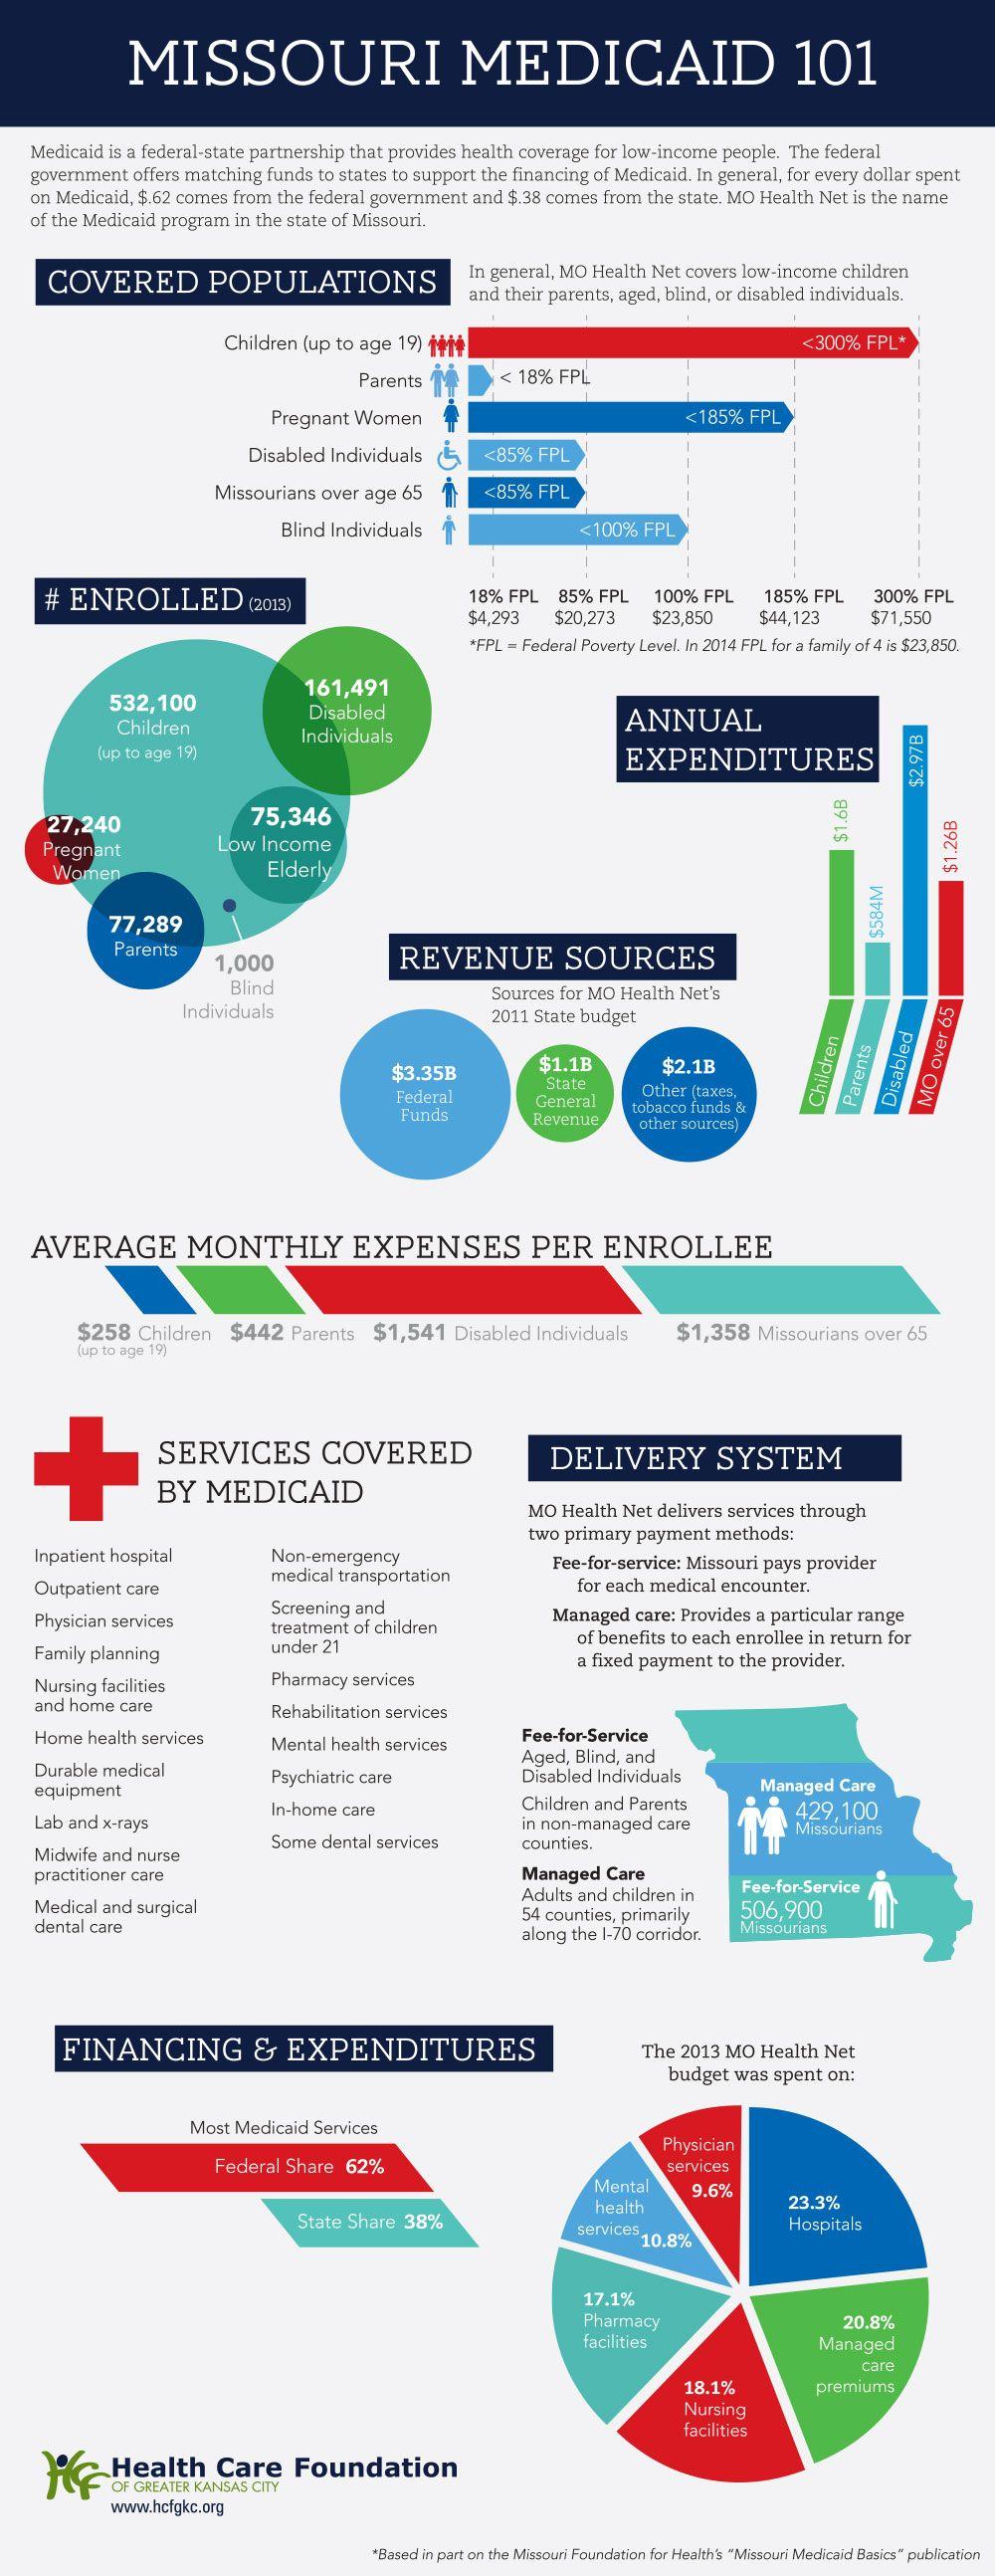 Missouri Medicaid 101 With Images Medicaid Missouri Infographic